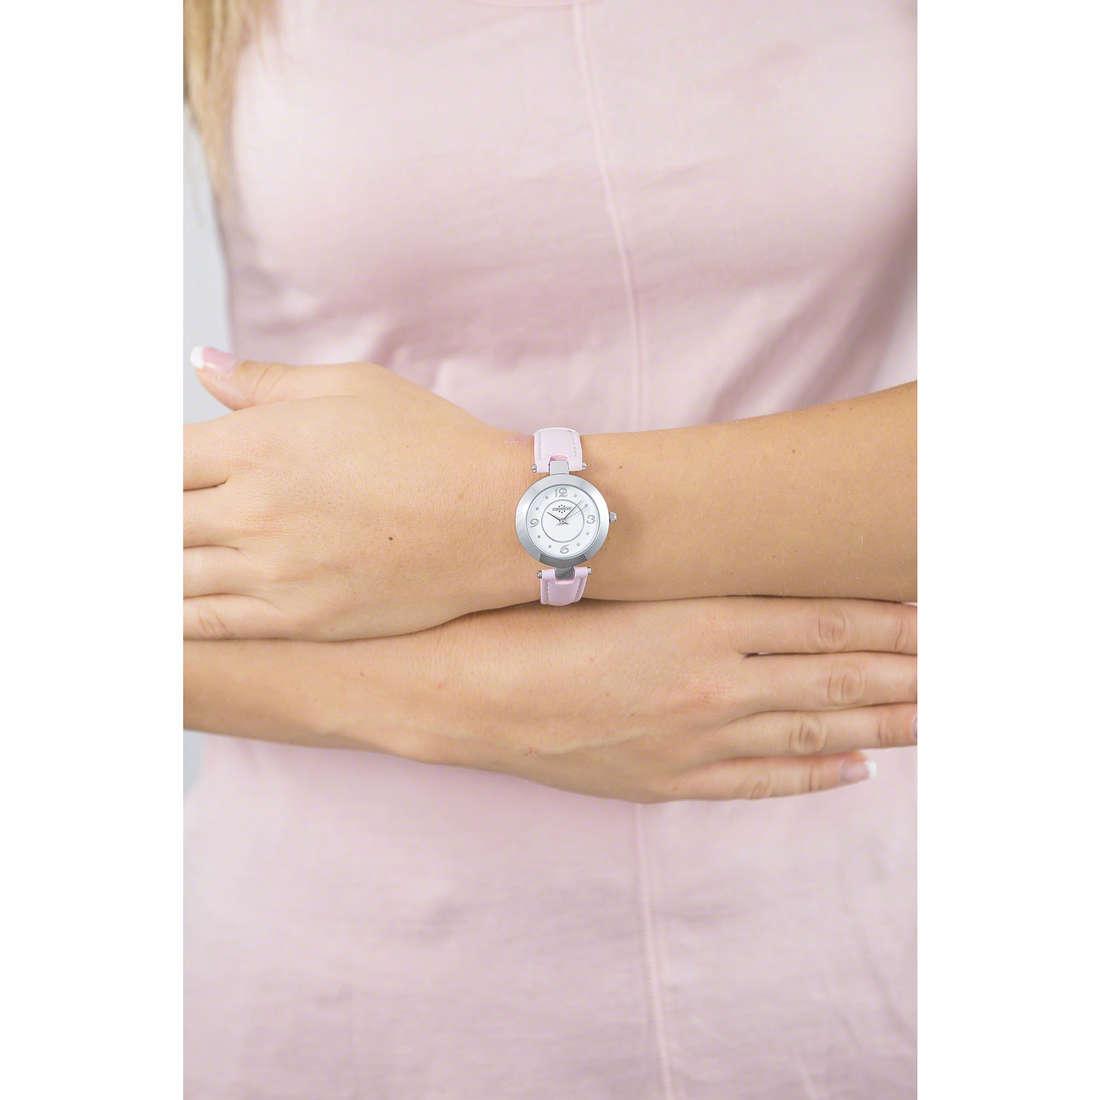 Chronostar solo tempo Pastel donna R3751243509 indosso